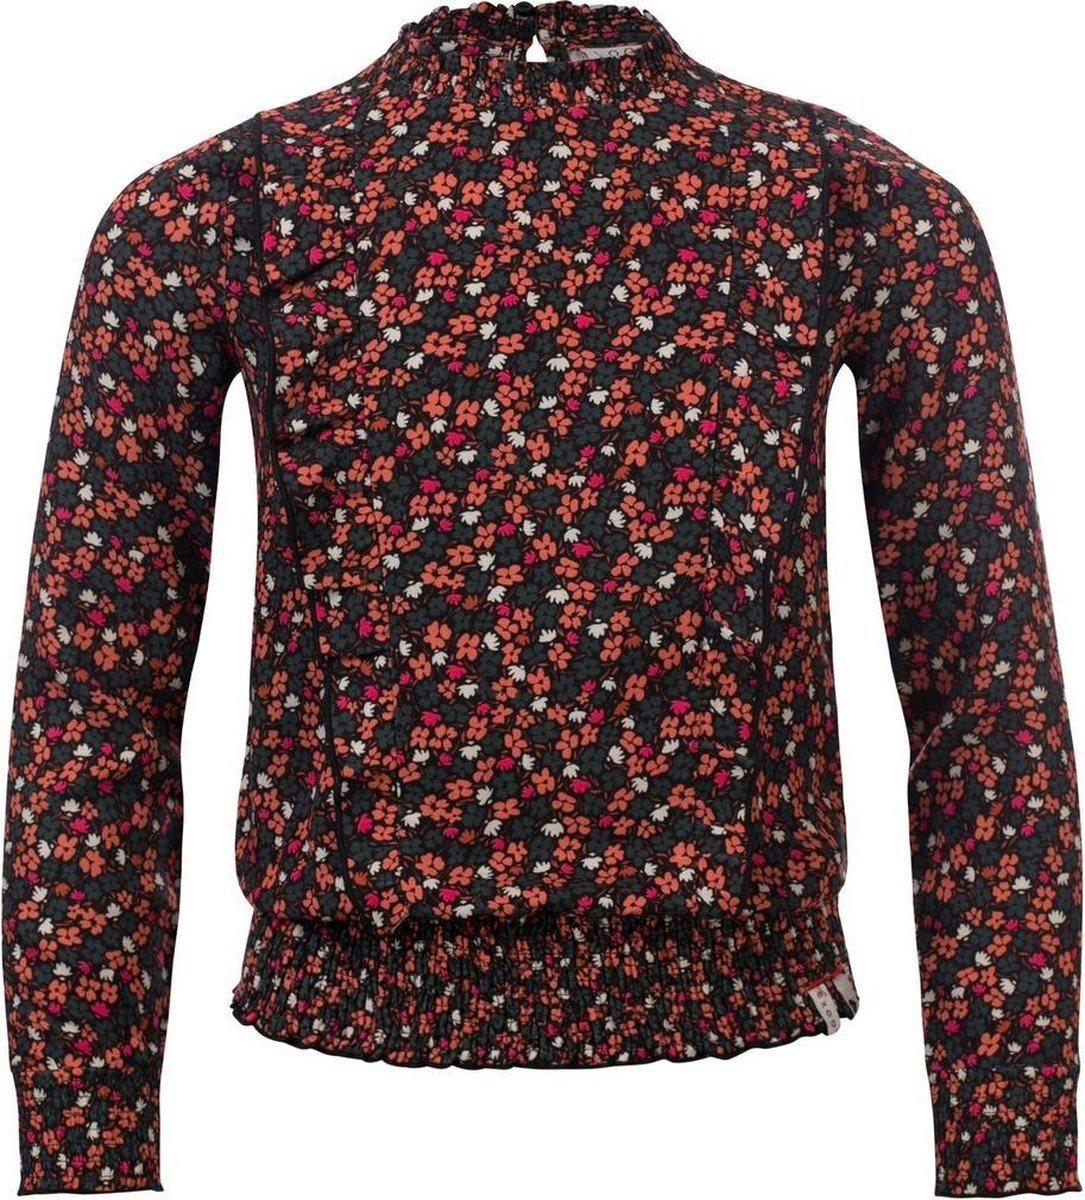 Looxs ruffel blouse